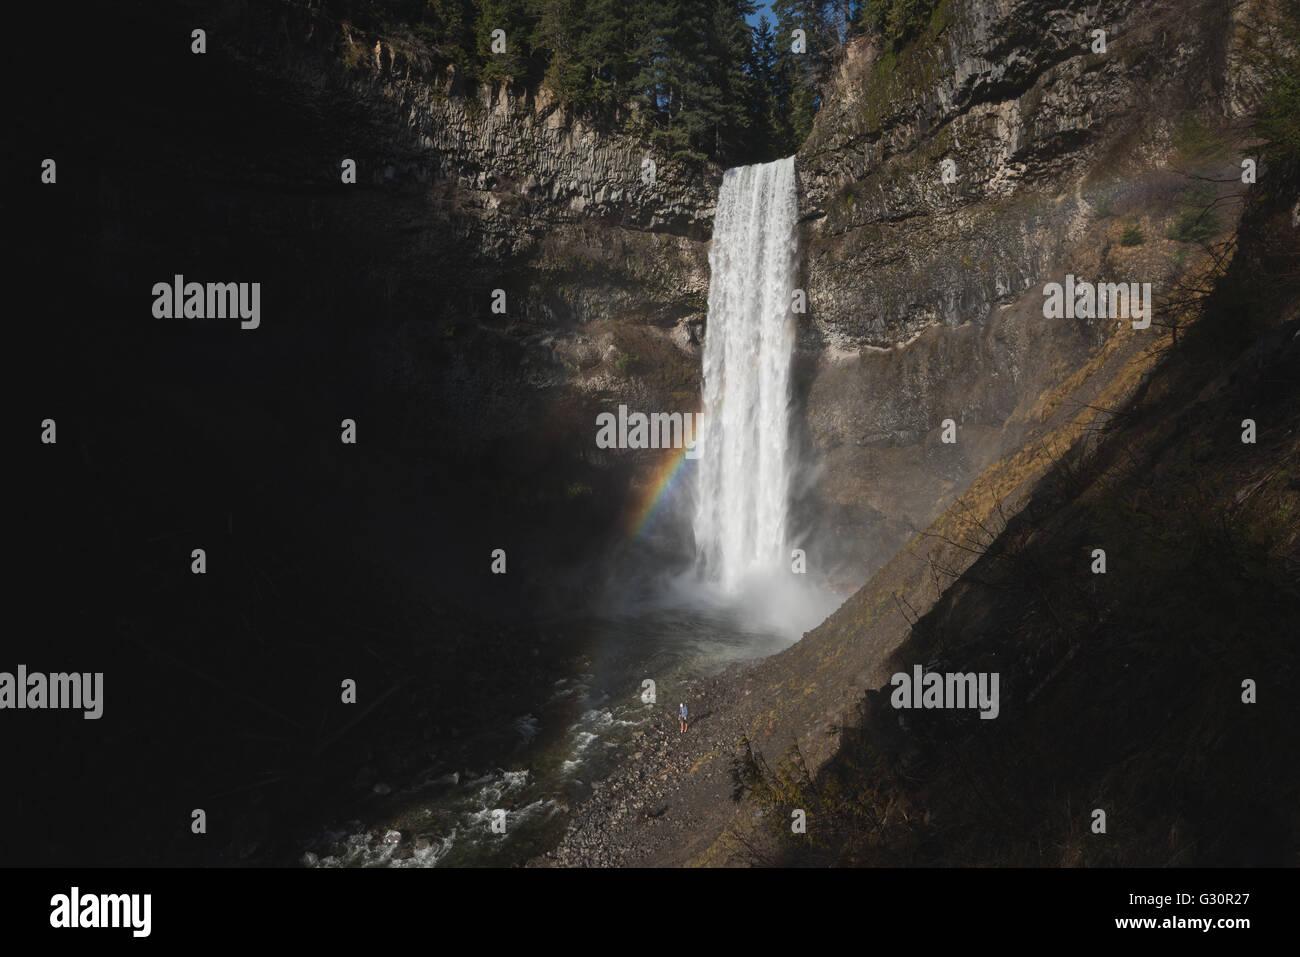 Brandywine falls near Whistler in Canada - Stock Image